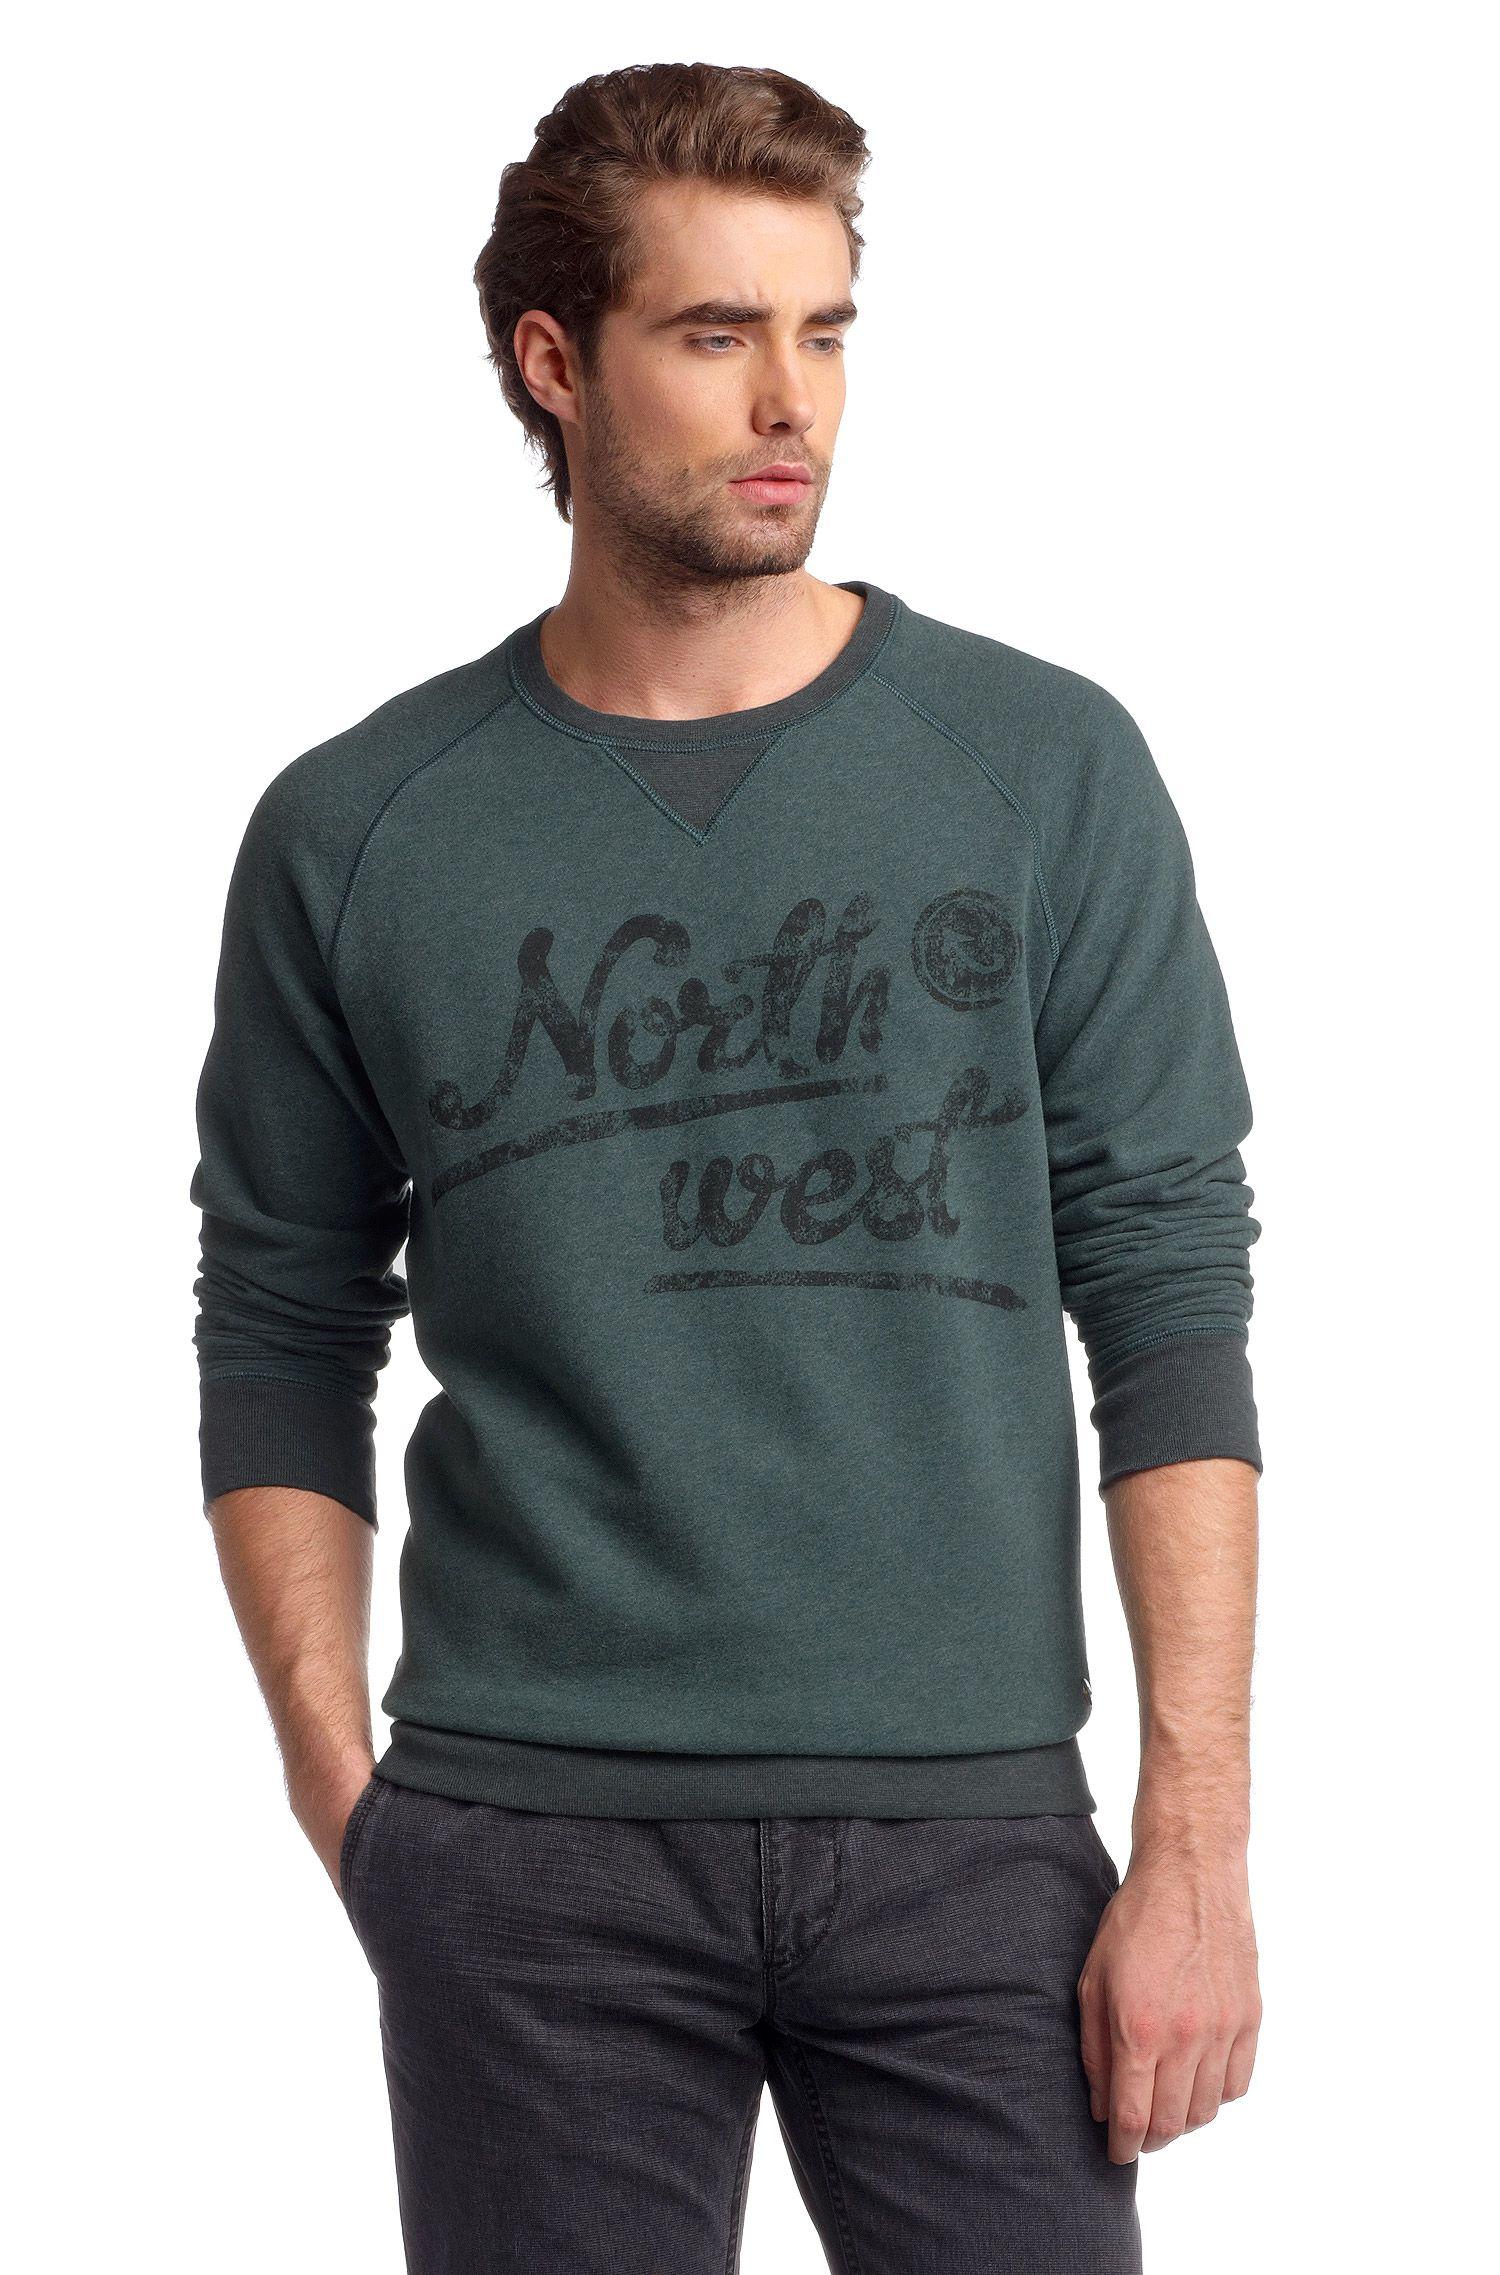 Sweatshirt ´Wic` mit Brustprint